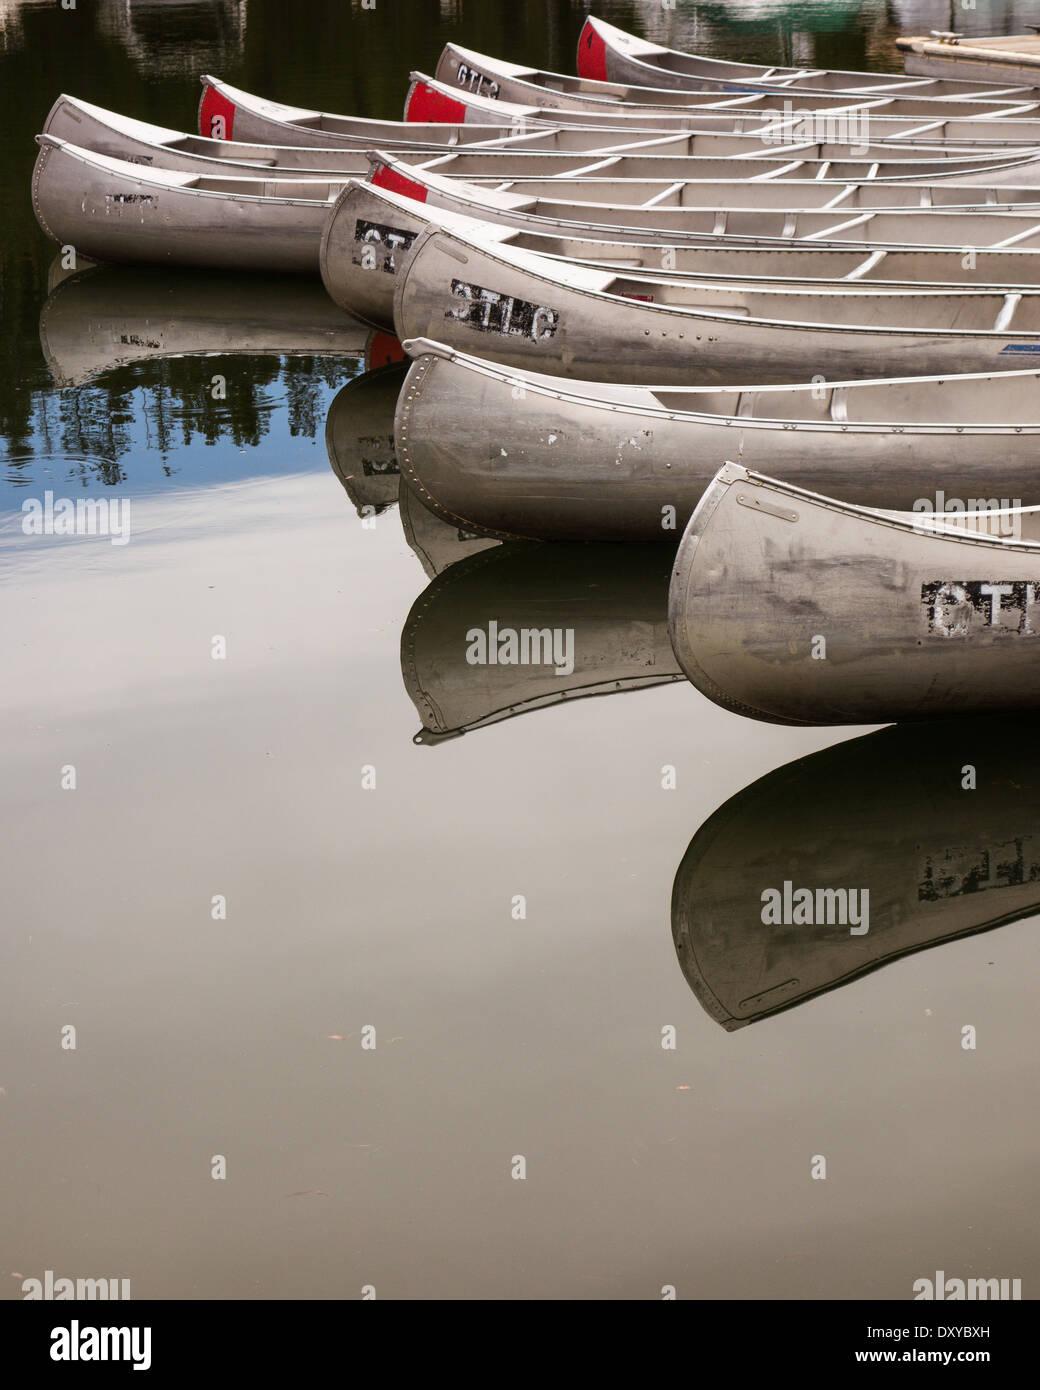 Canoes at Colter Bay Marina on Jackson Lake in Grand Teton National Park. Stock Photo